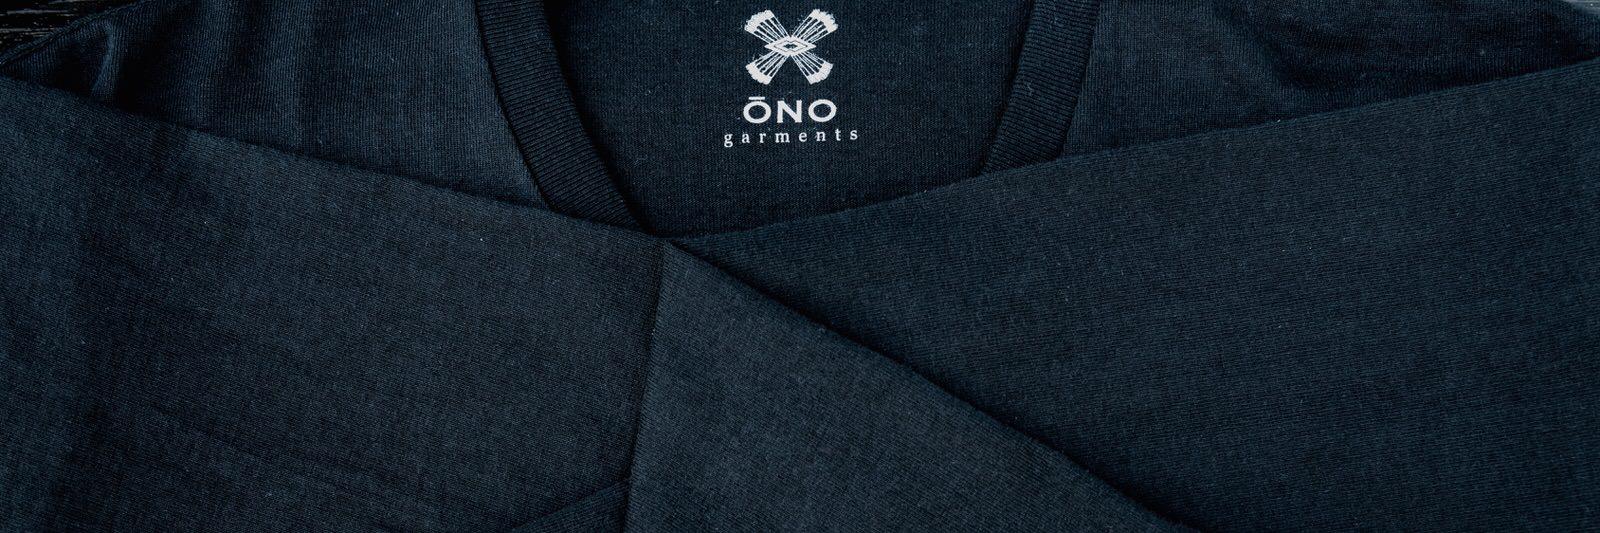 Ōno - Garments